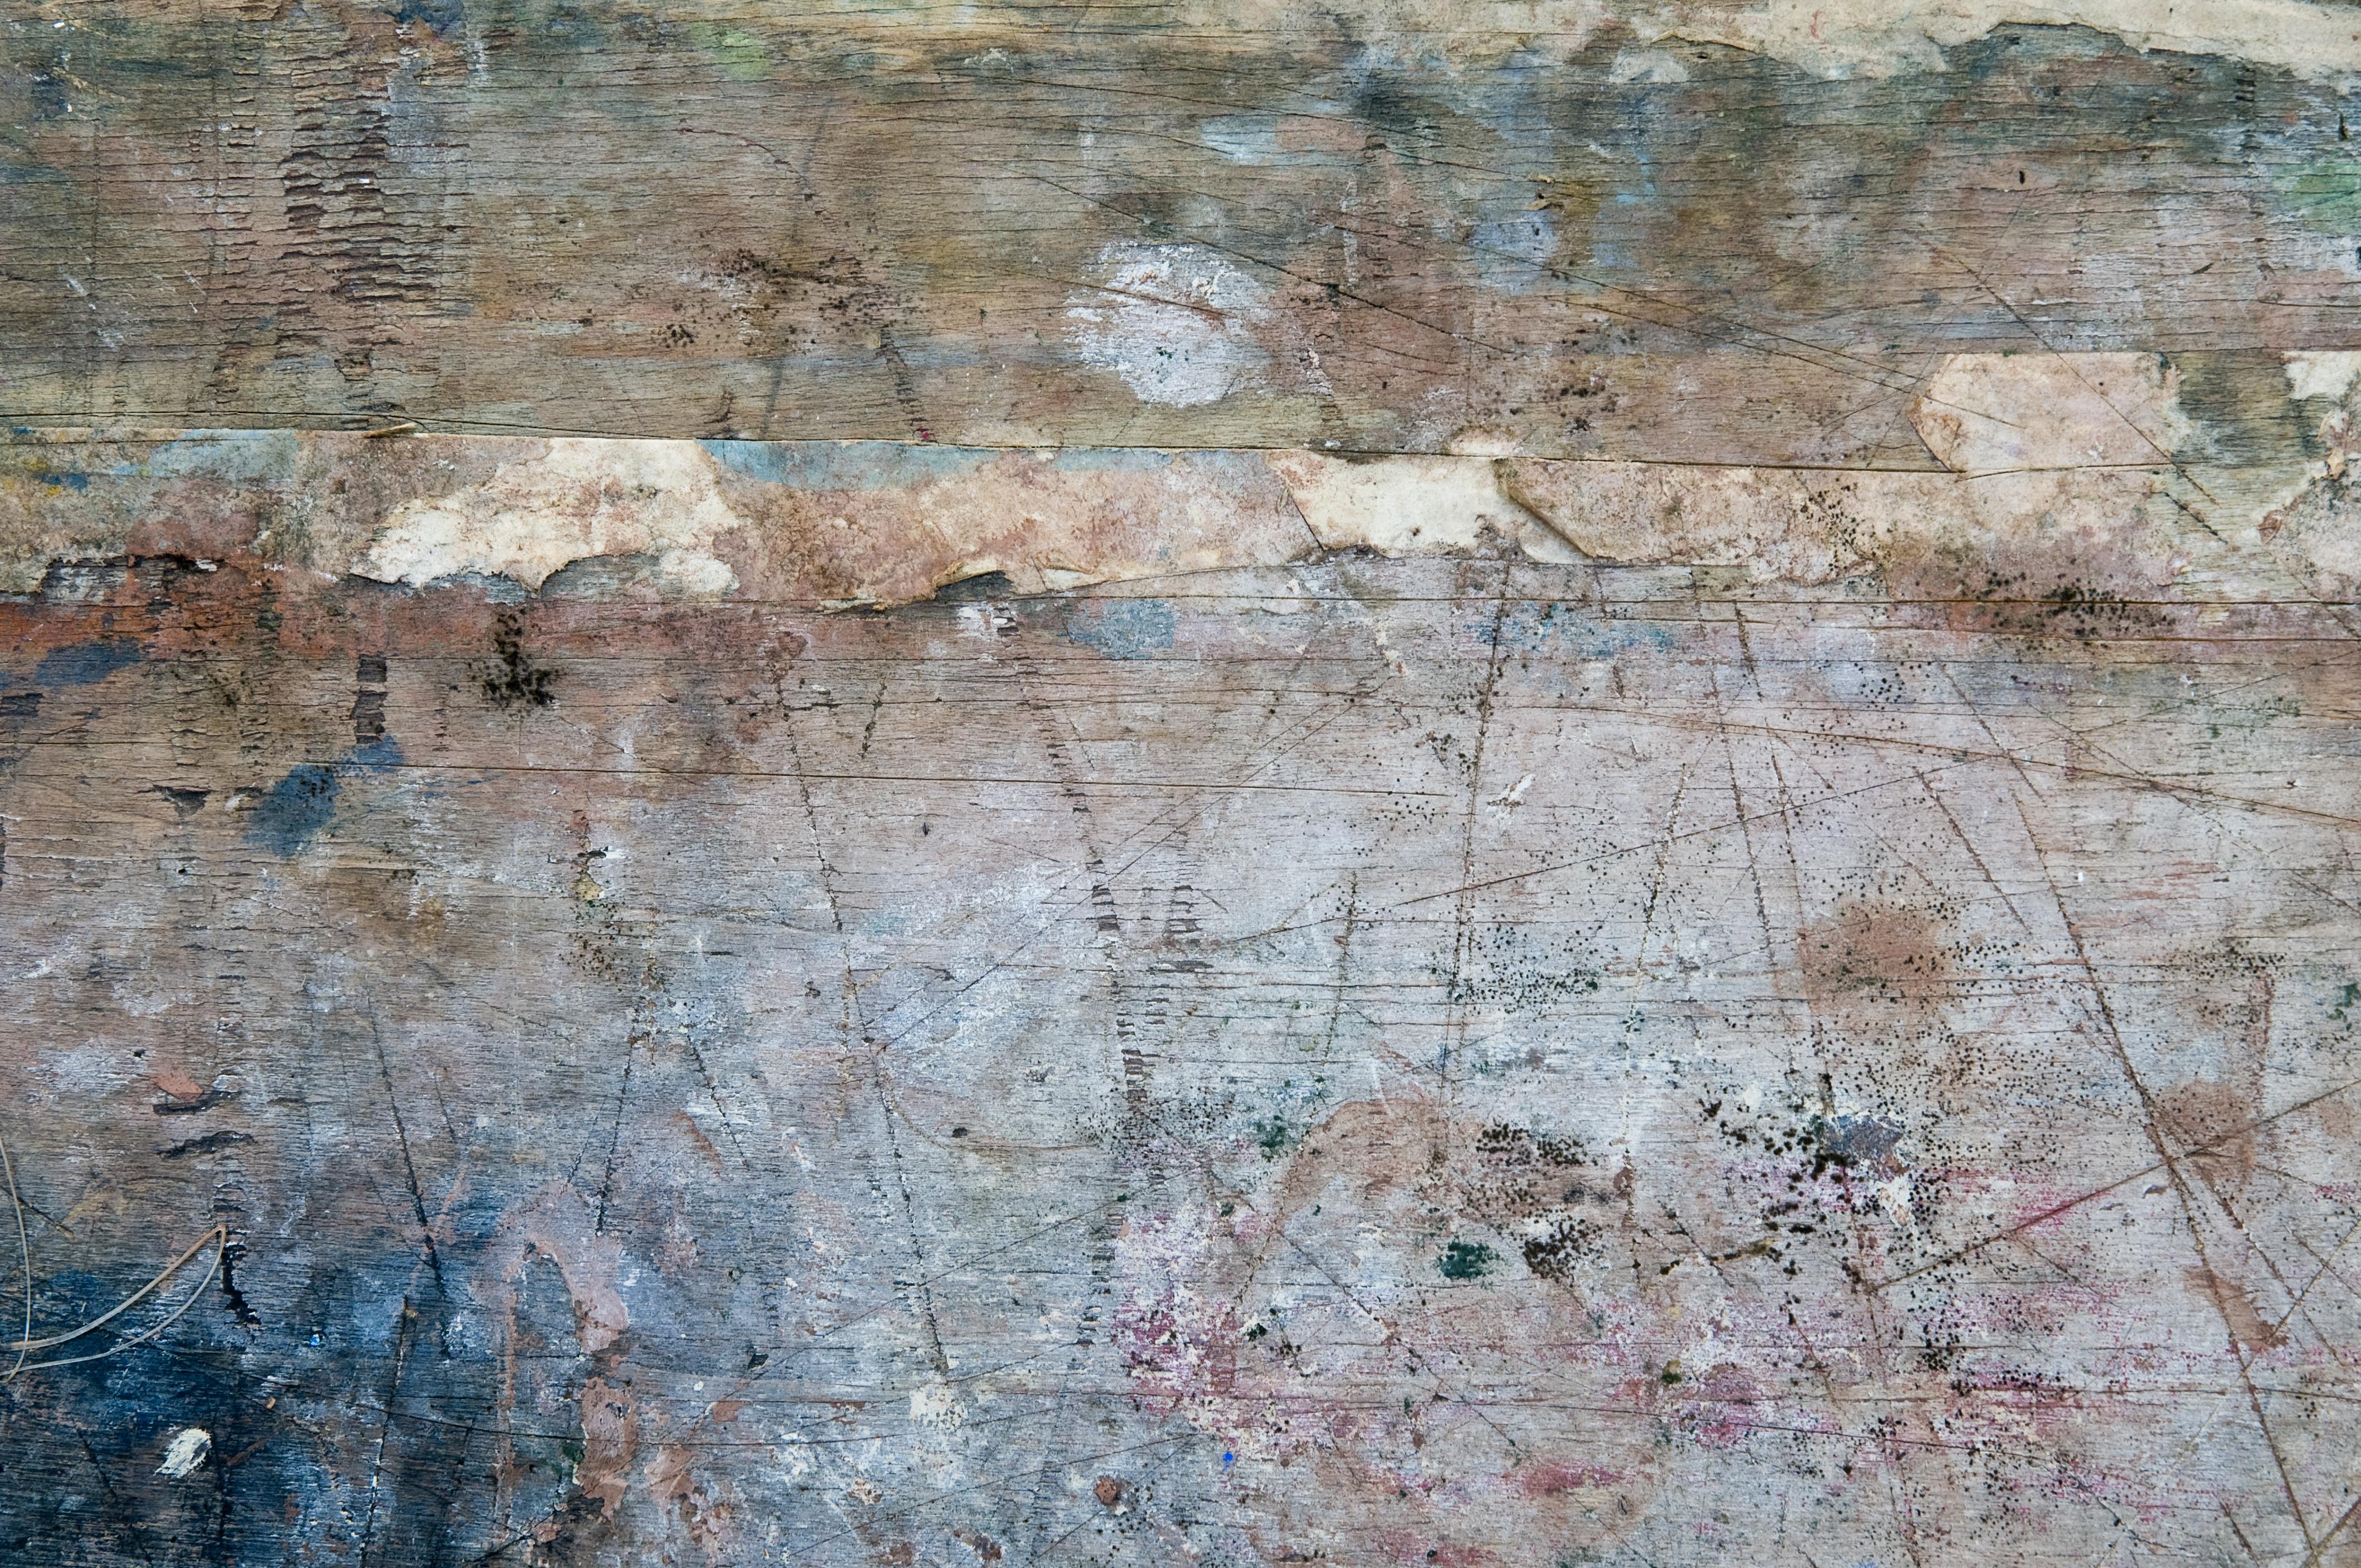 Untitled Texture CCCXXXXVIII by aqueous-sun-textures